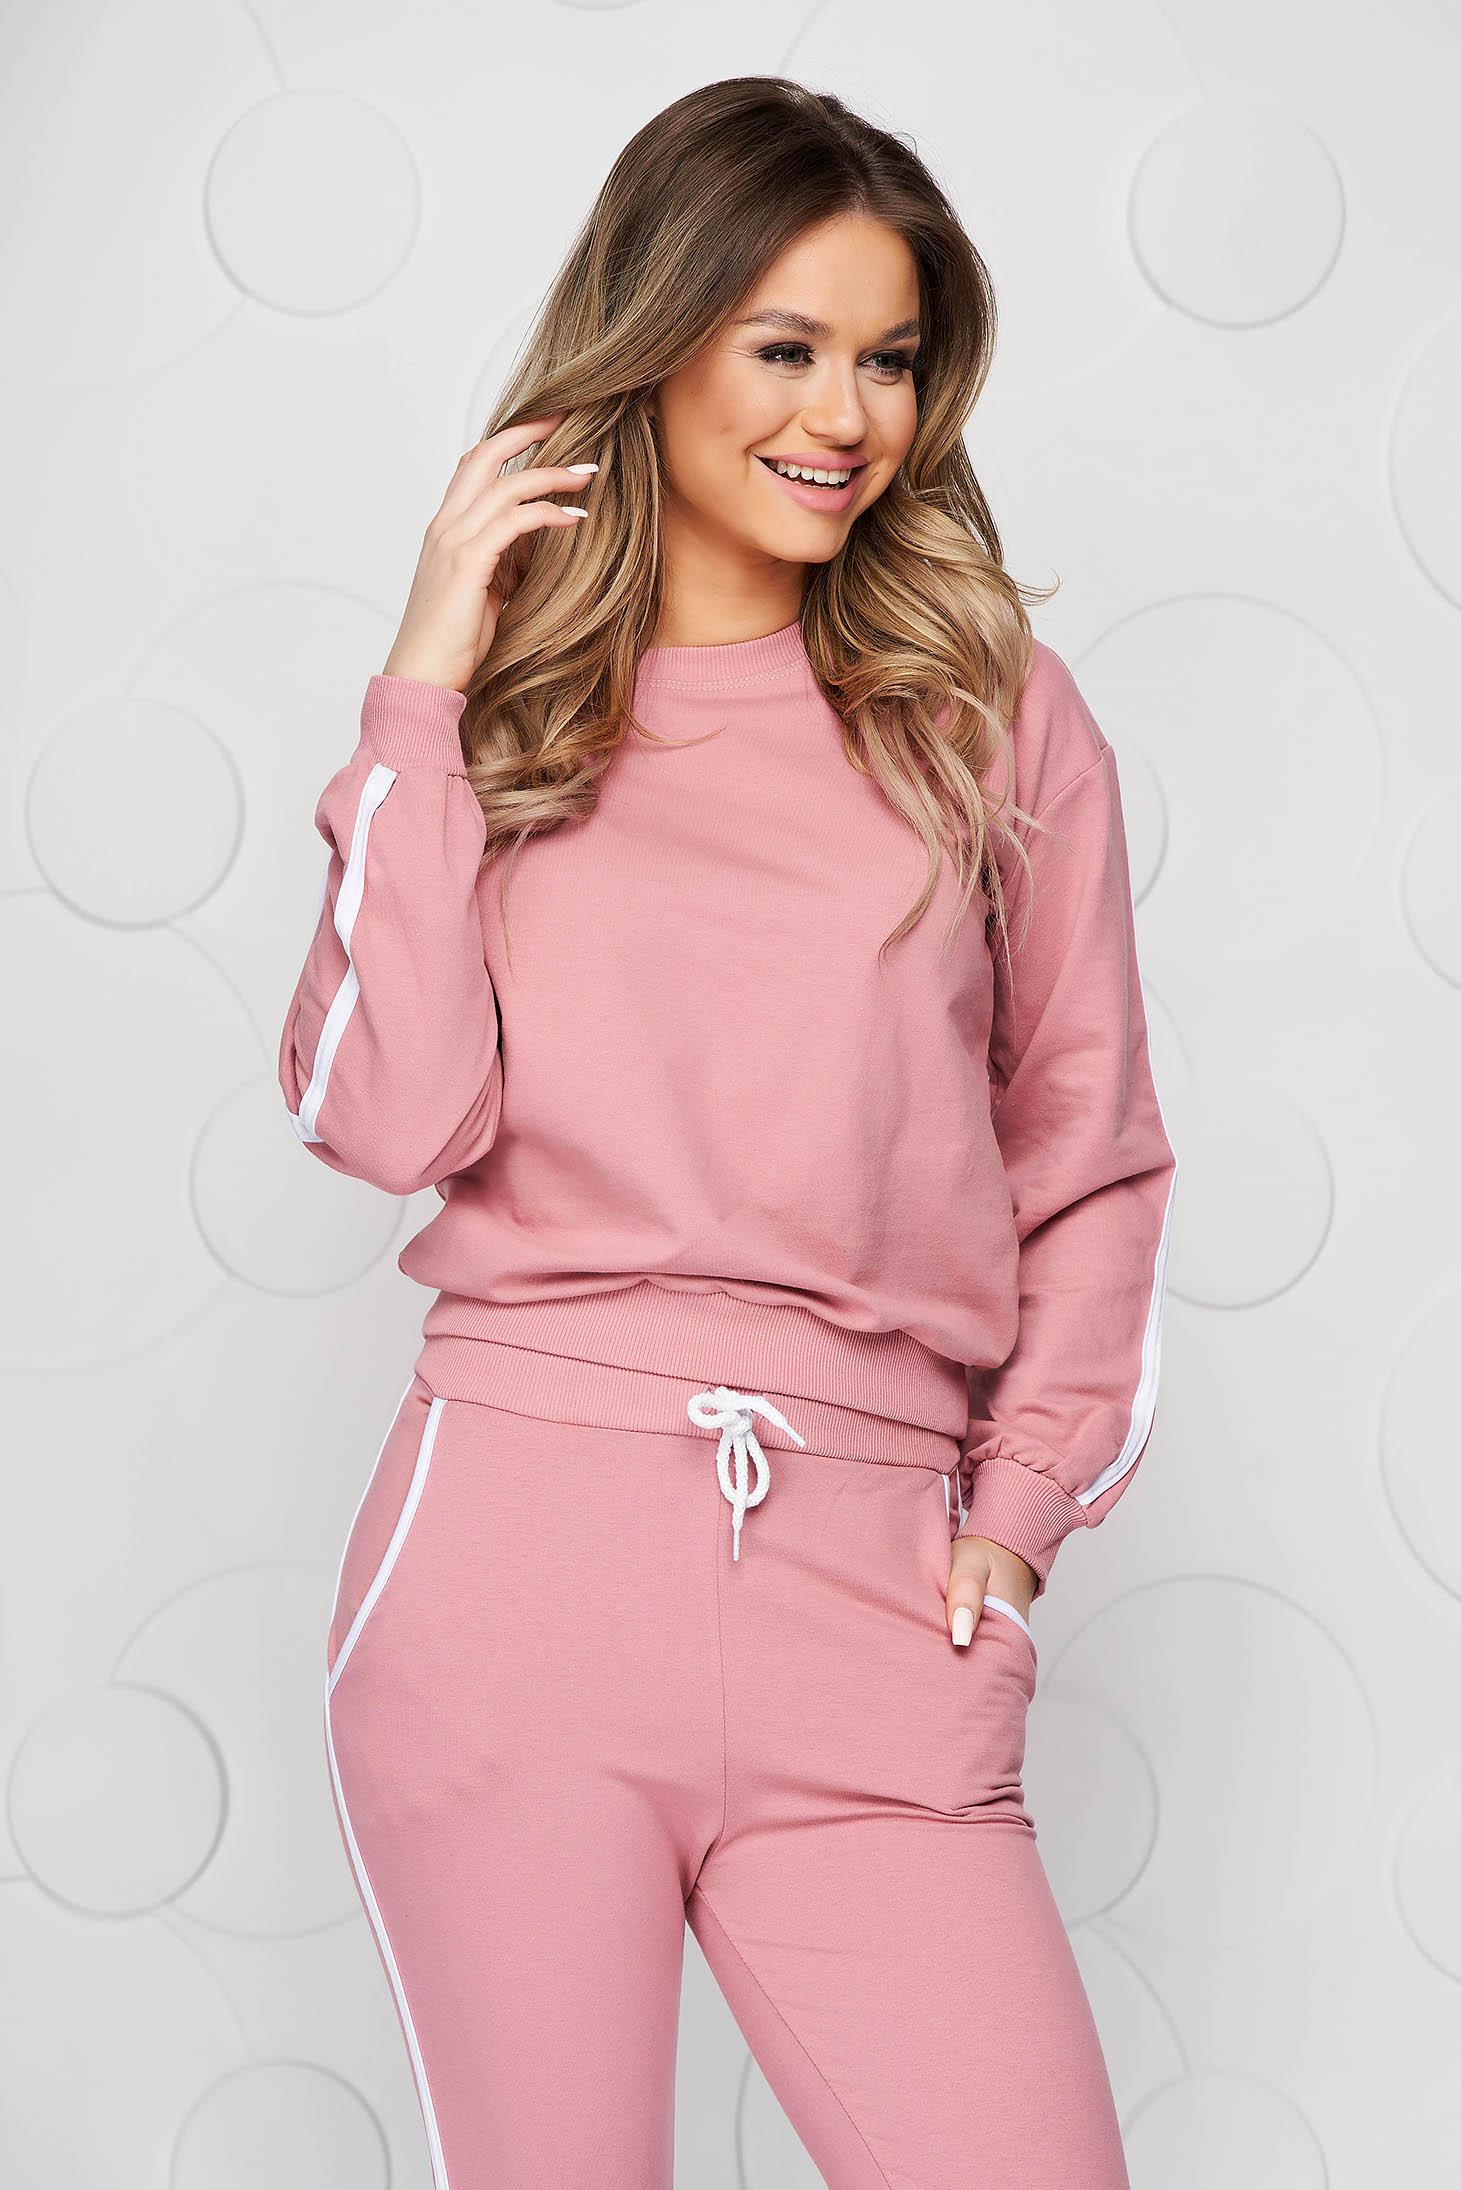 Pink sport 2 pieces 2 pieces cotton casual